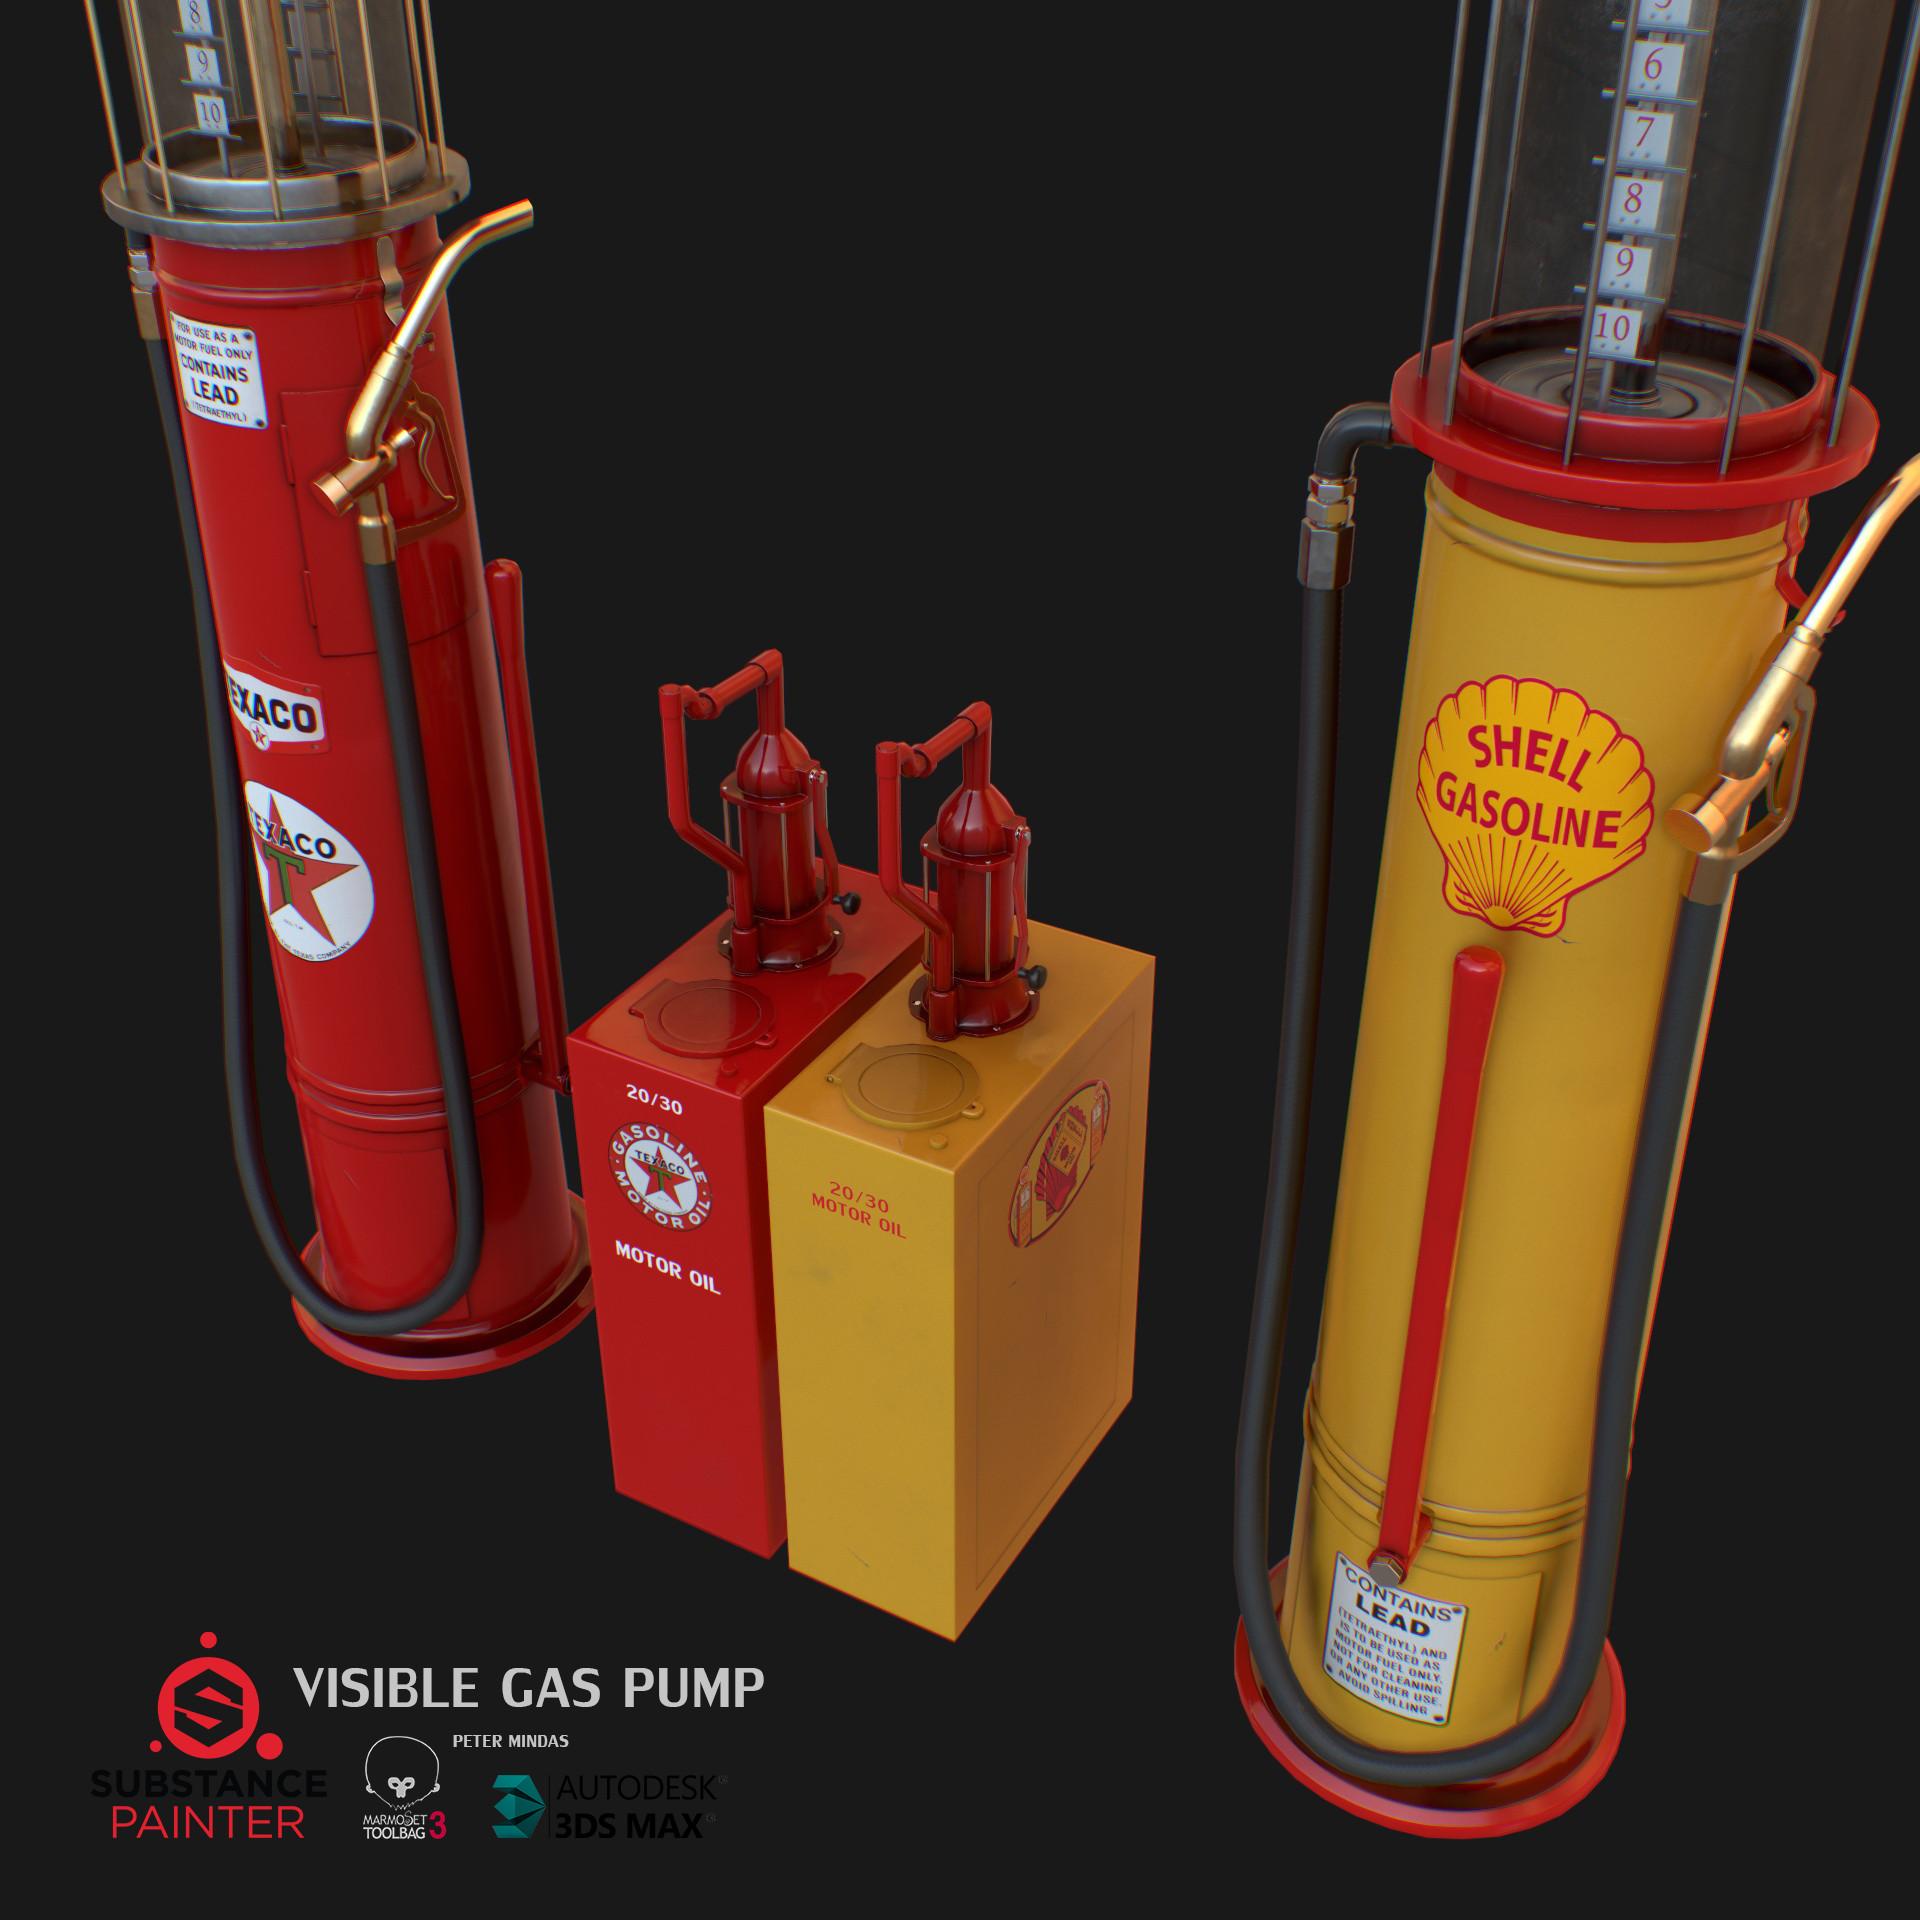 Peter Minďaš - Visible gas pump